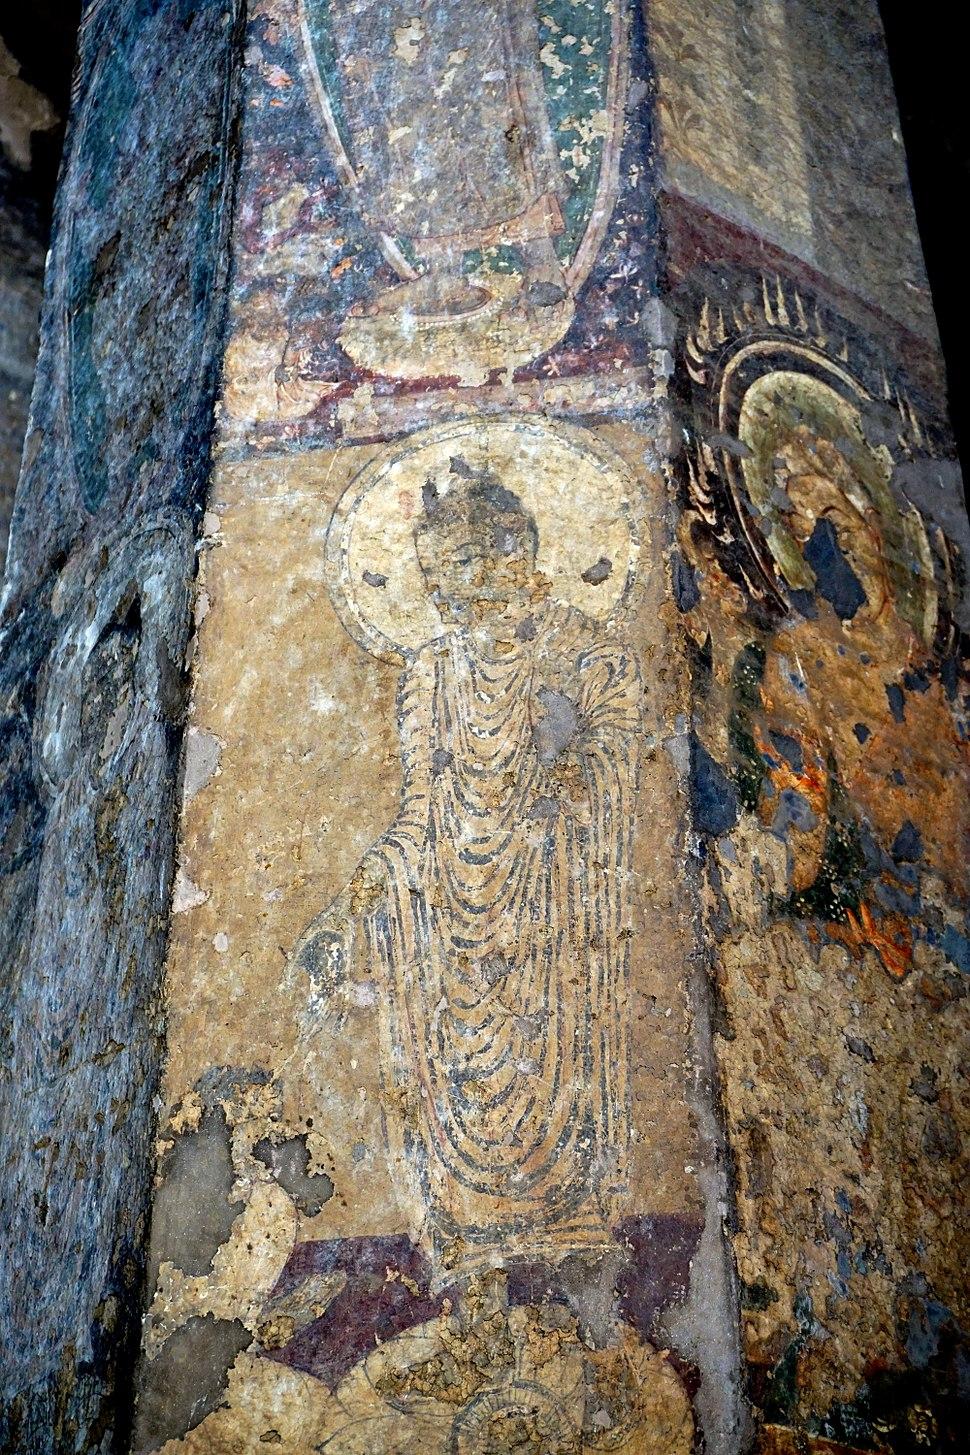 089 Cave 10, Buddha Drawing on Column (33896473480)